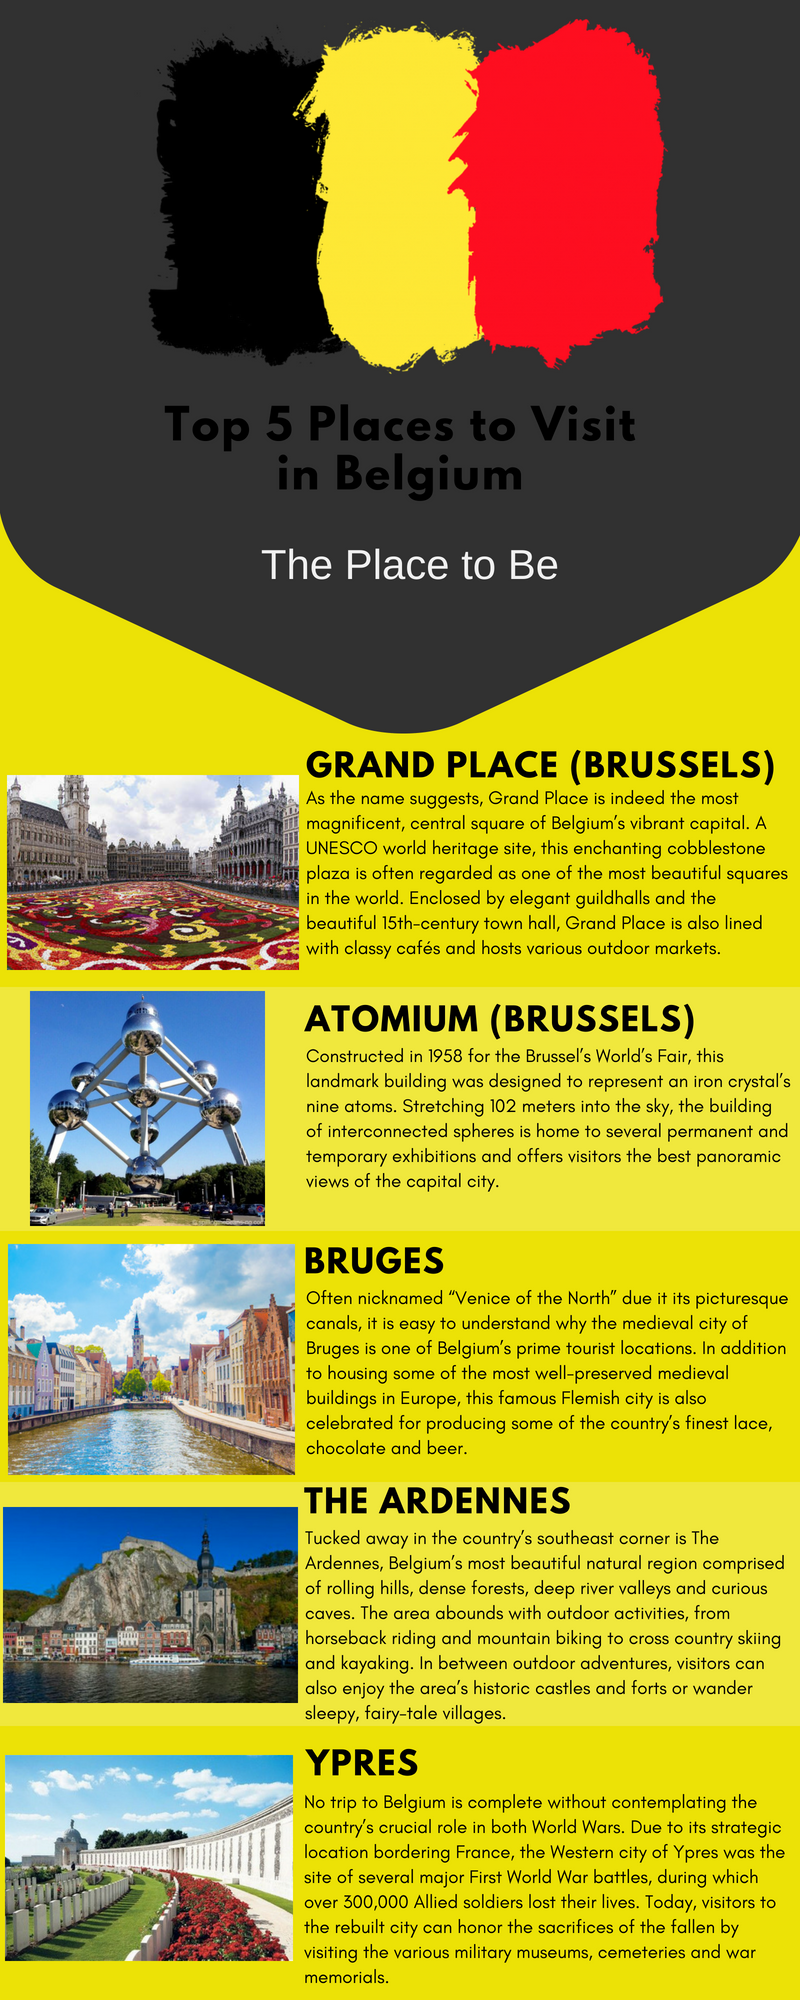 Top 5 Places to Visit in Belgium